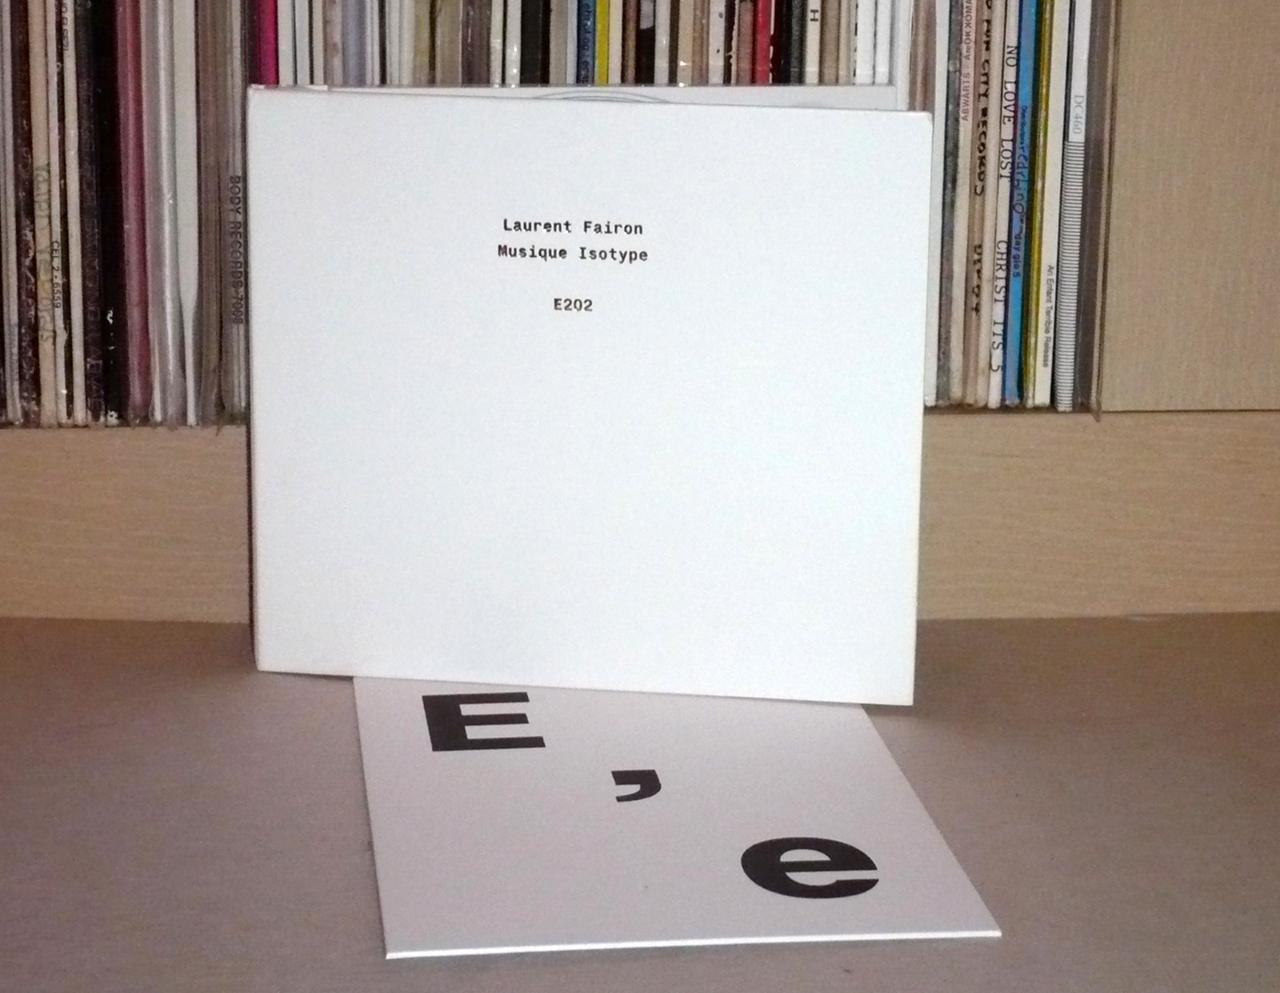 Laurent Fairon's 'Musique Isotype' (2016)